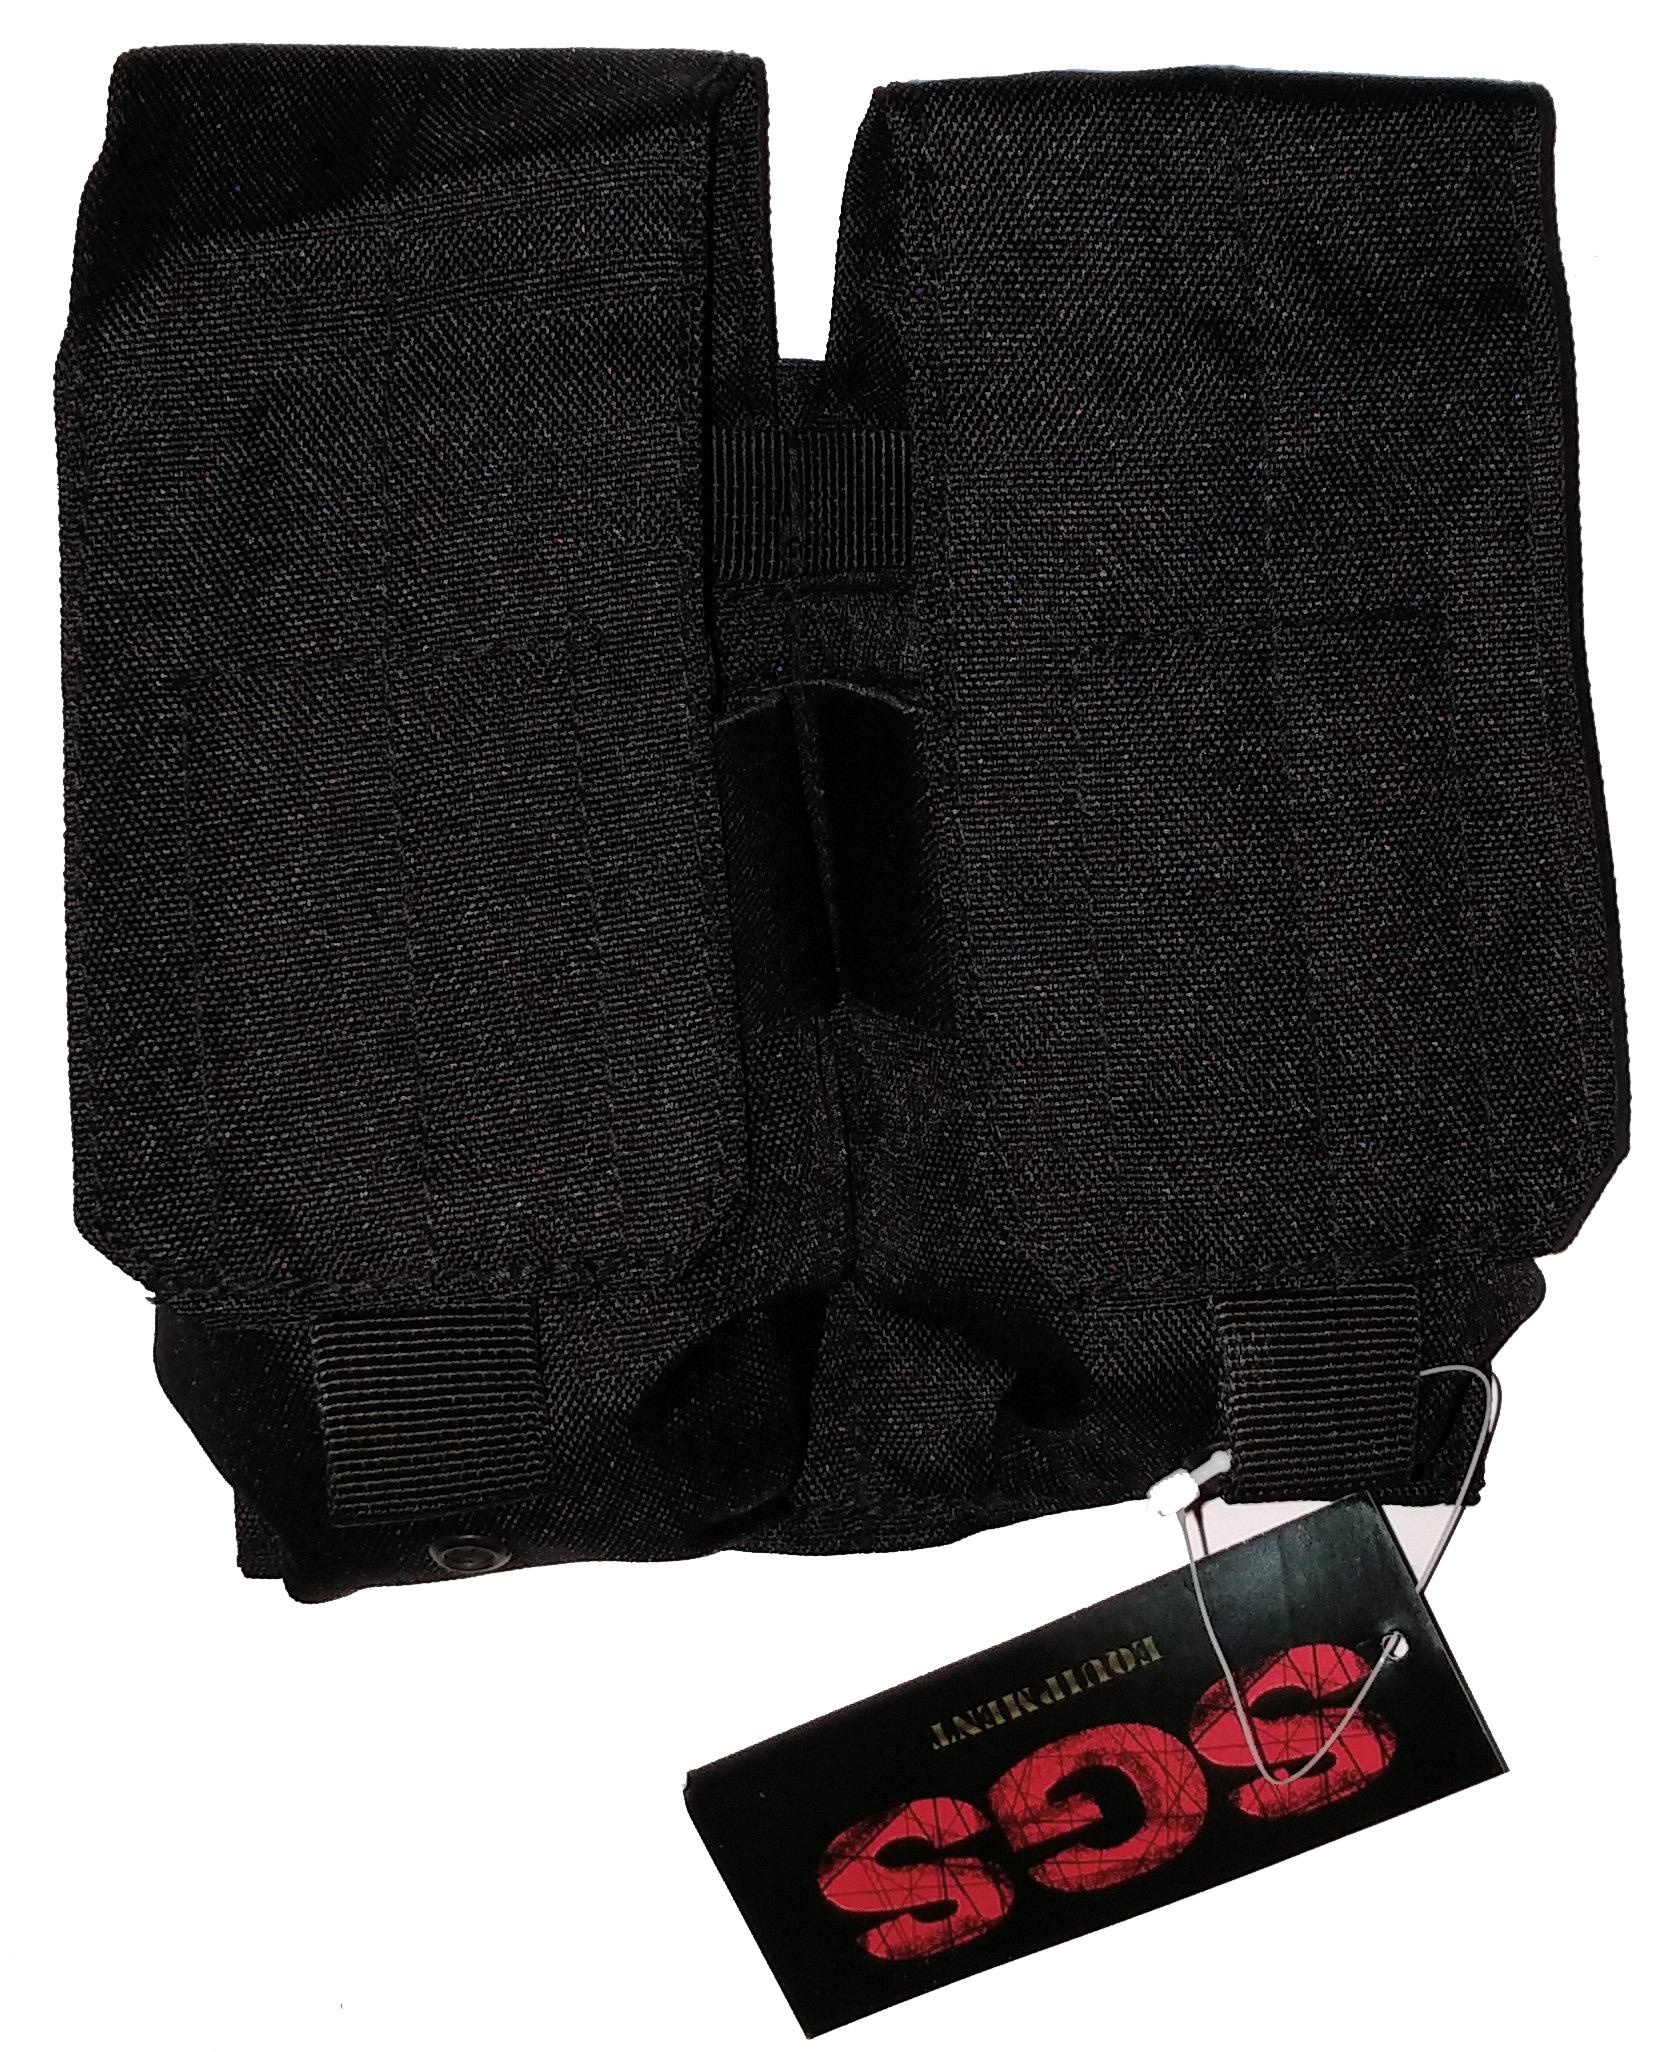 Black magazine pouch